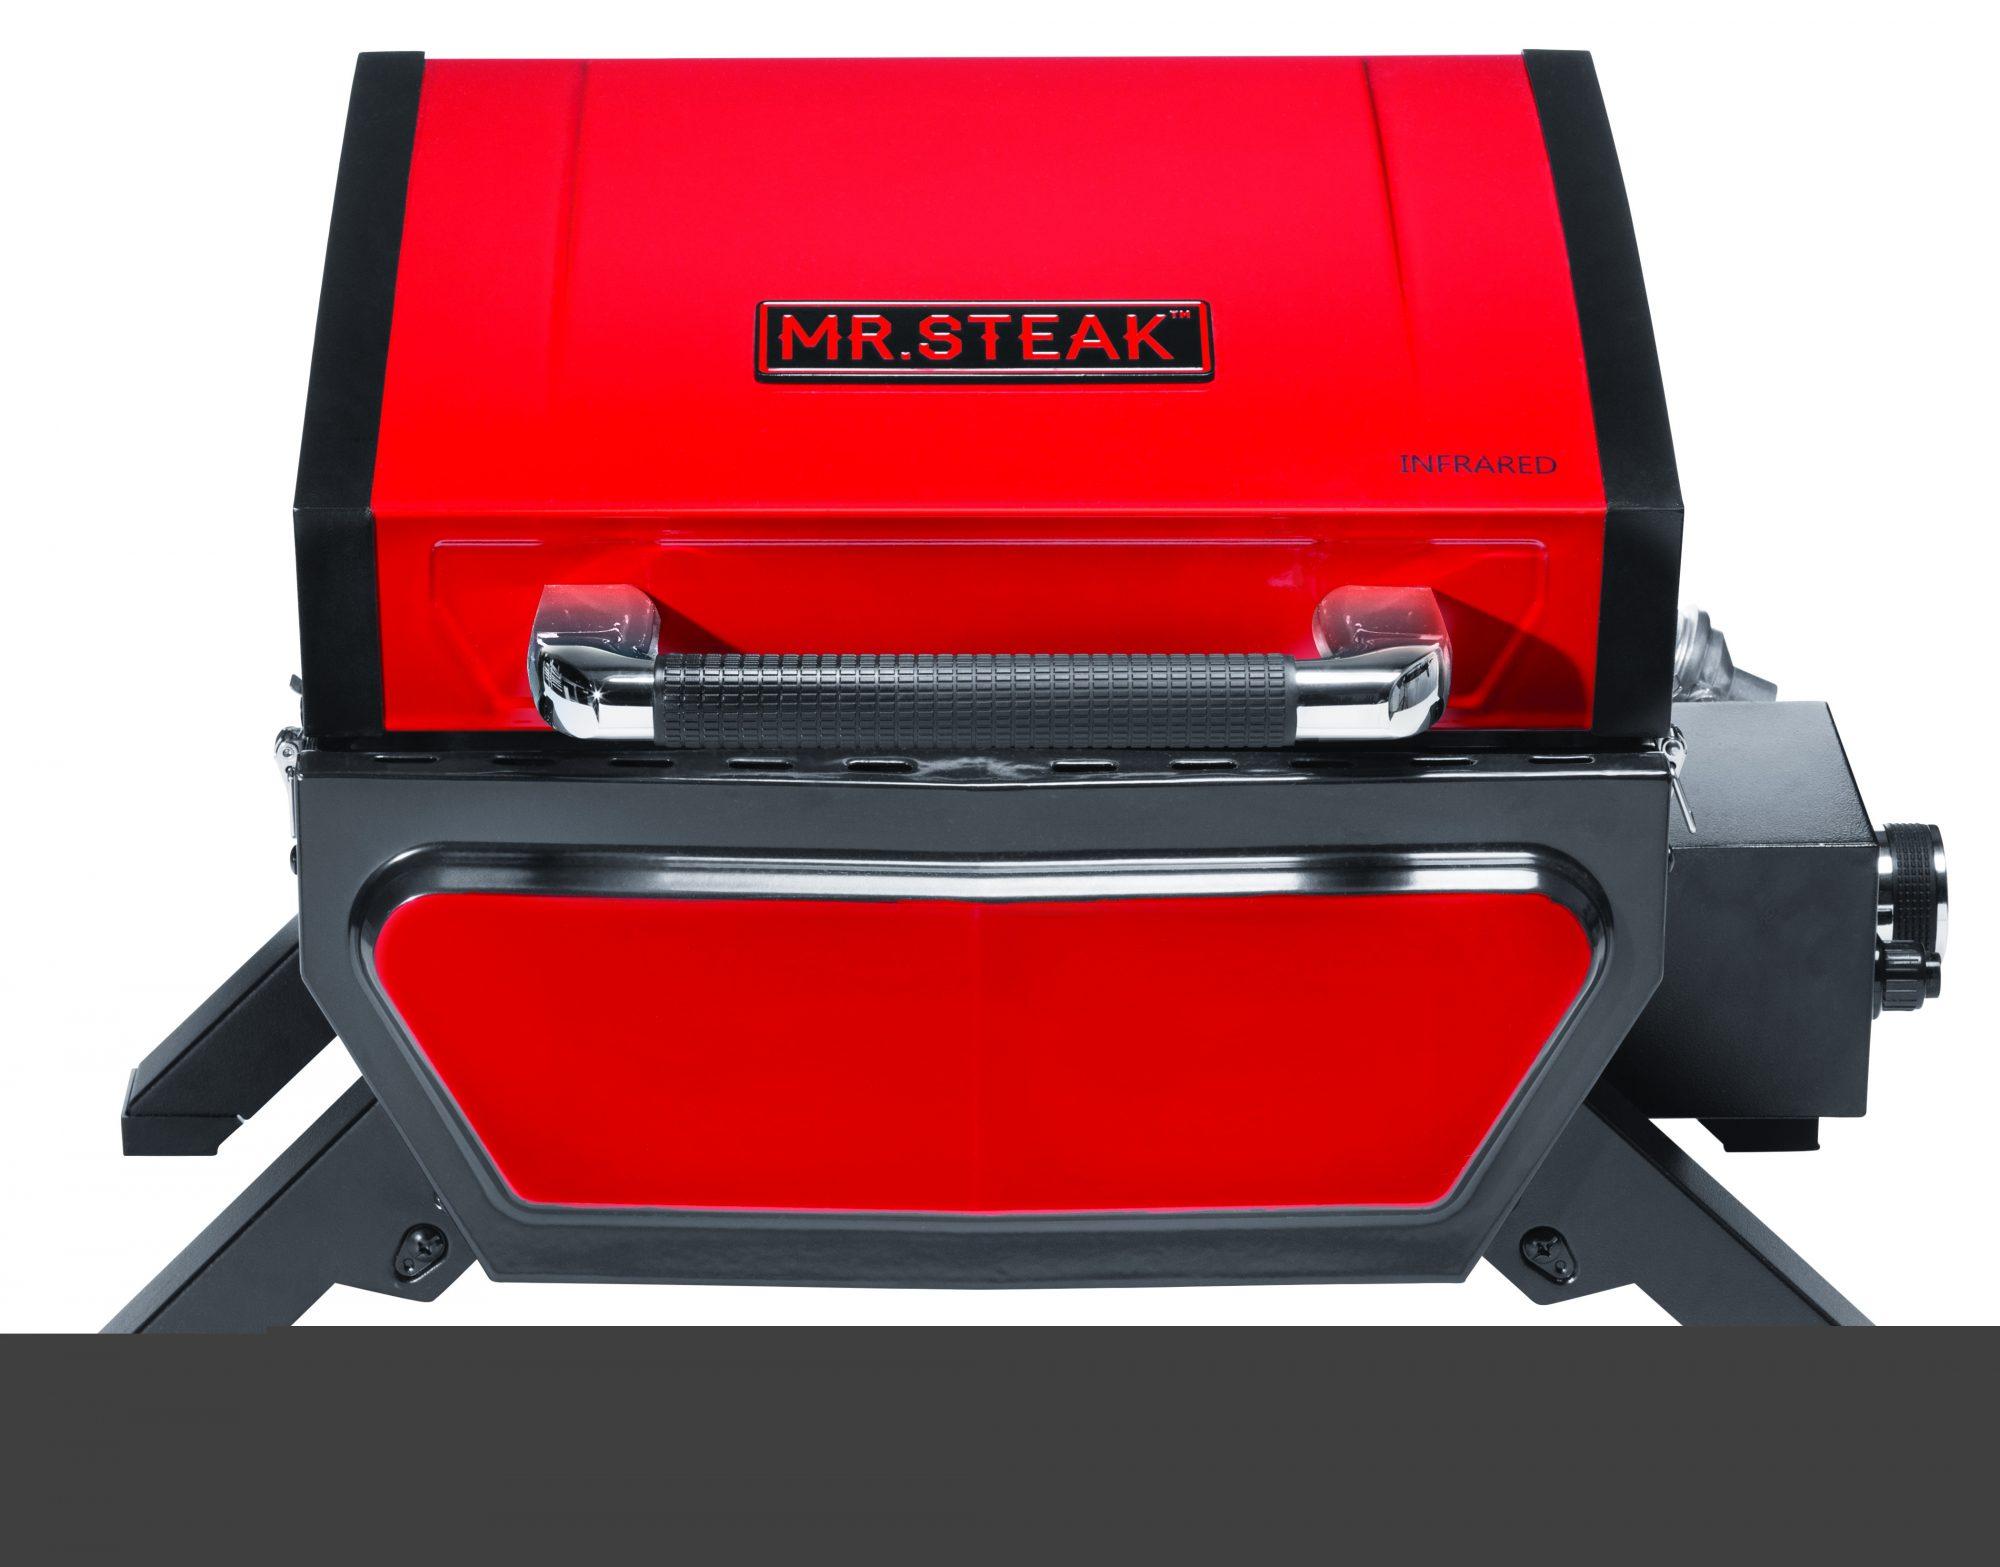 Mr Steak Grill Image